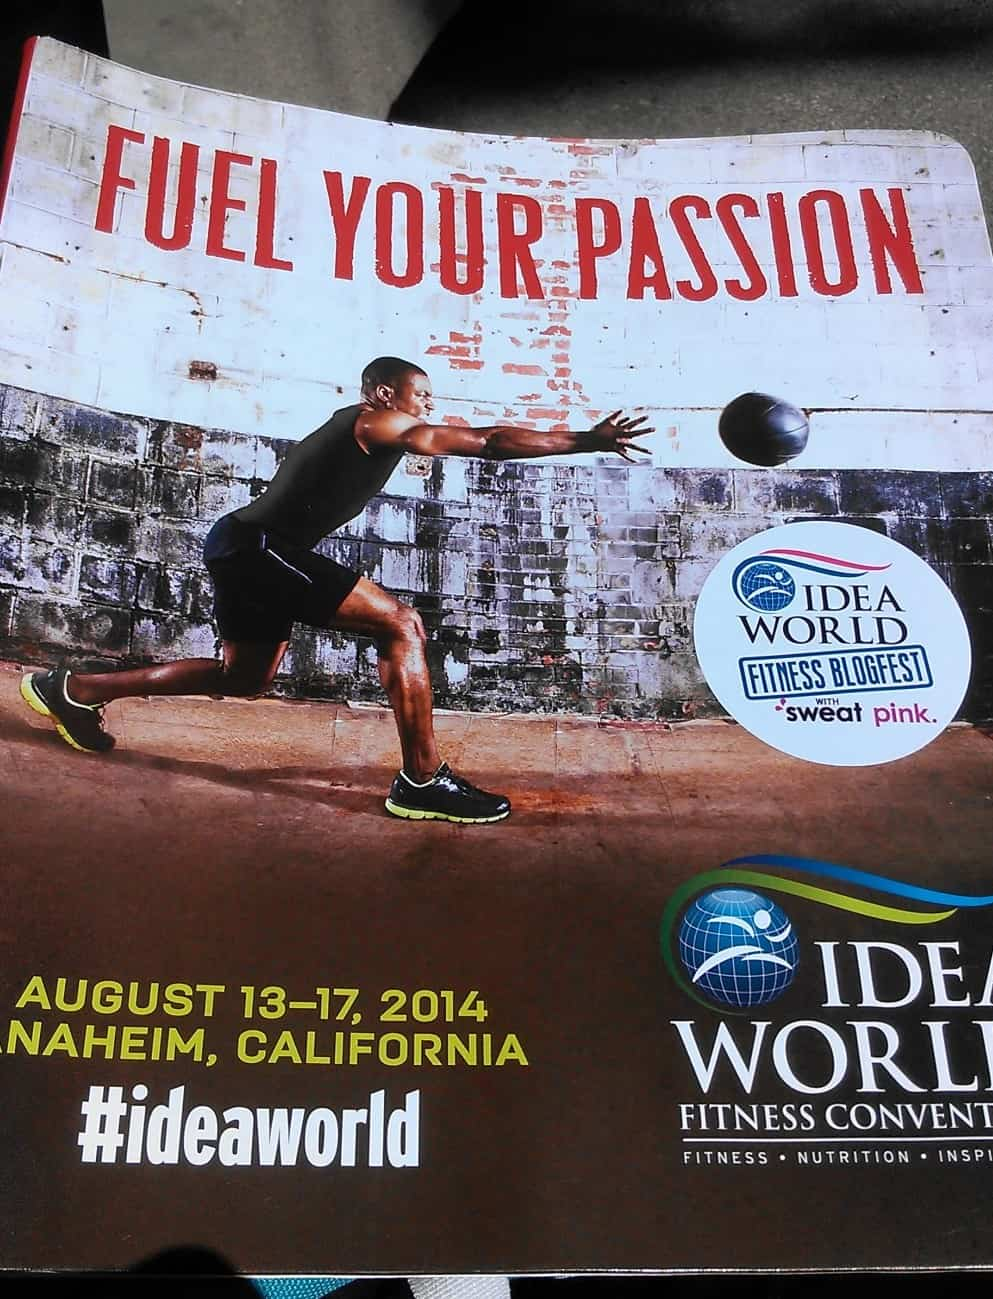 IDEA World Convention Program